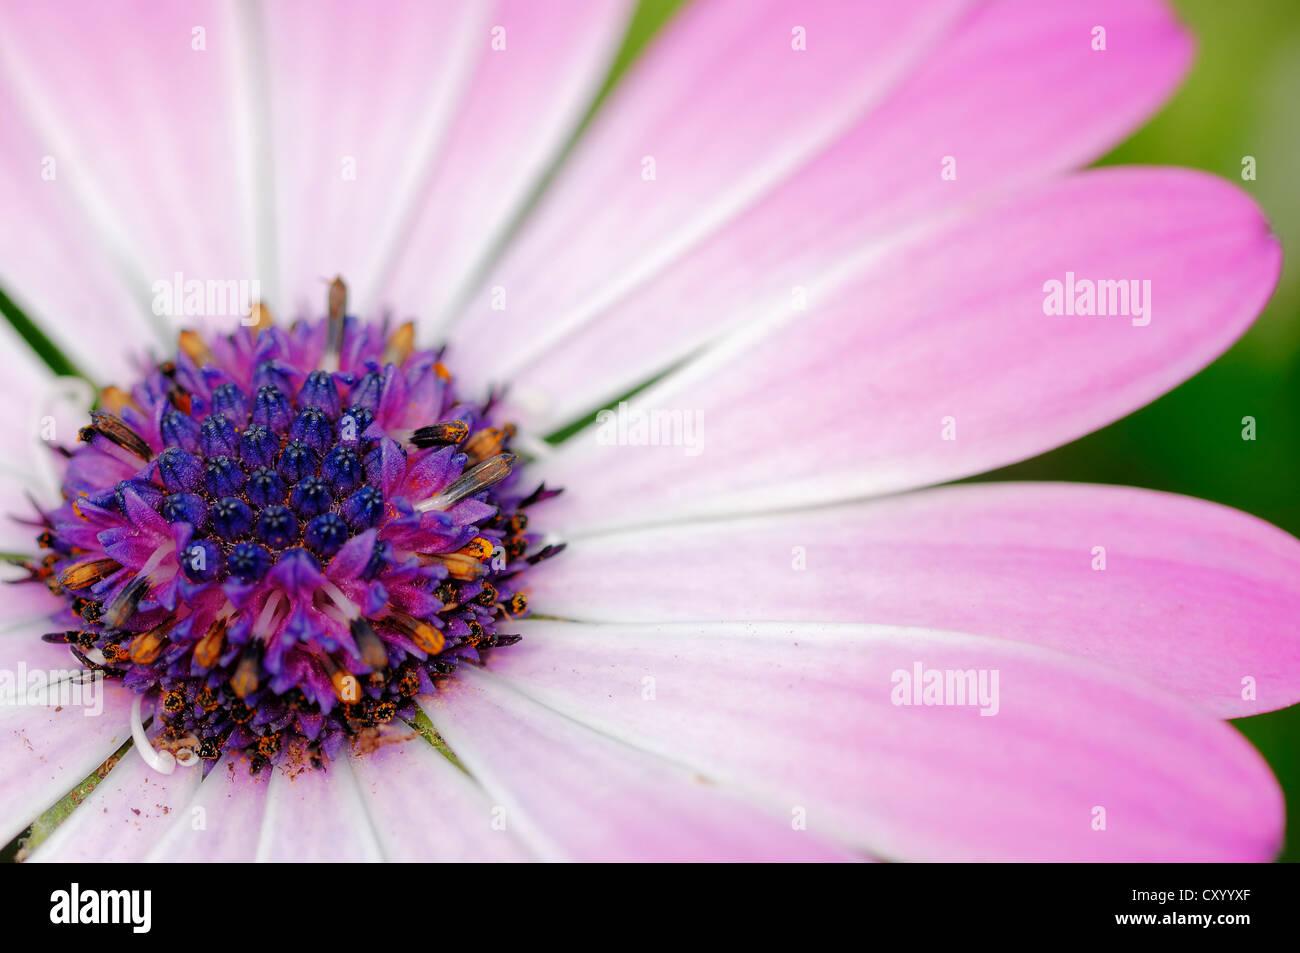 Cape marguerite, Van Staden's River daisy, Sundays River daisy, White daisy bush, Blue-and-white daisy bush, - Stock Image